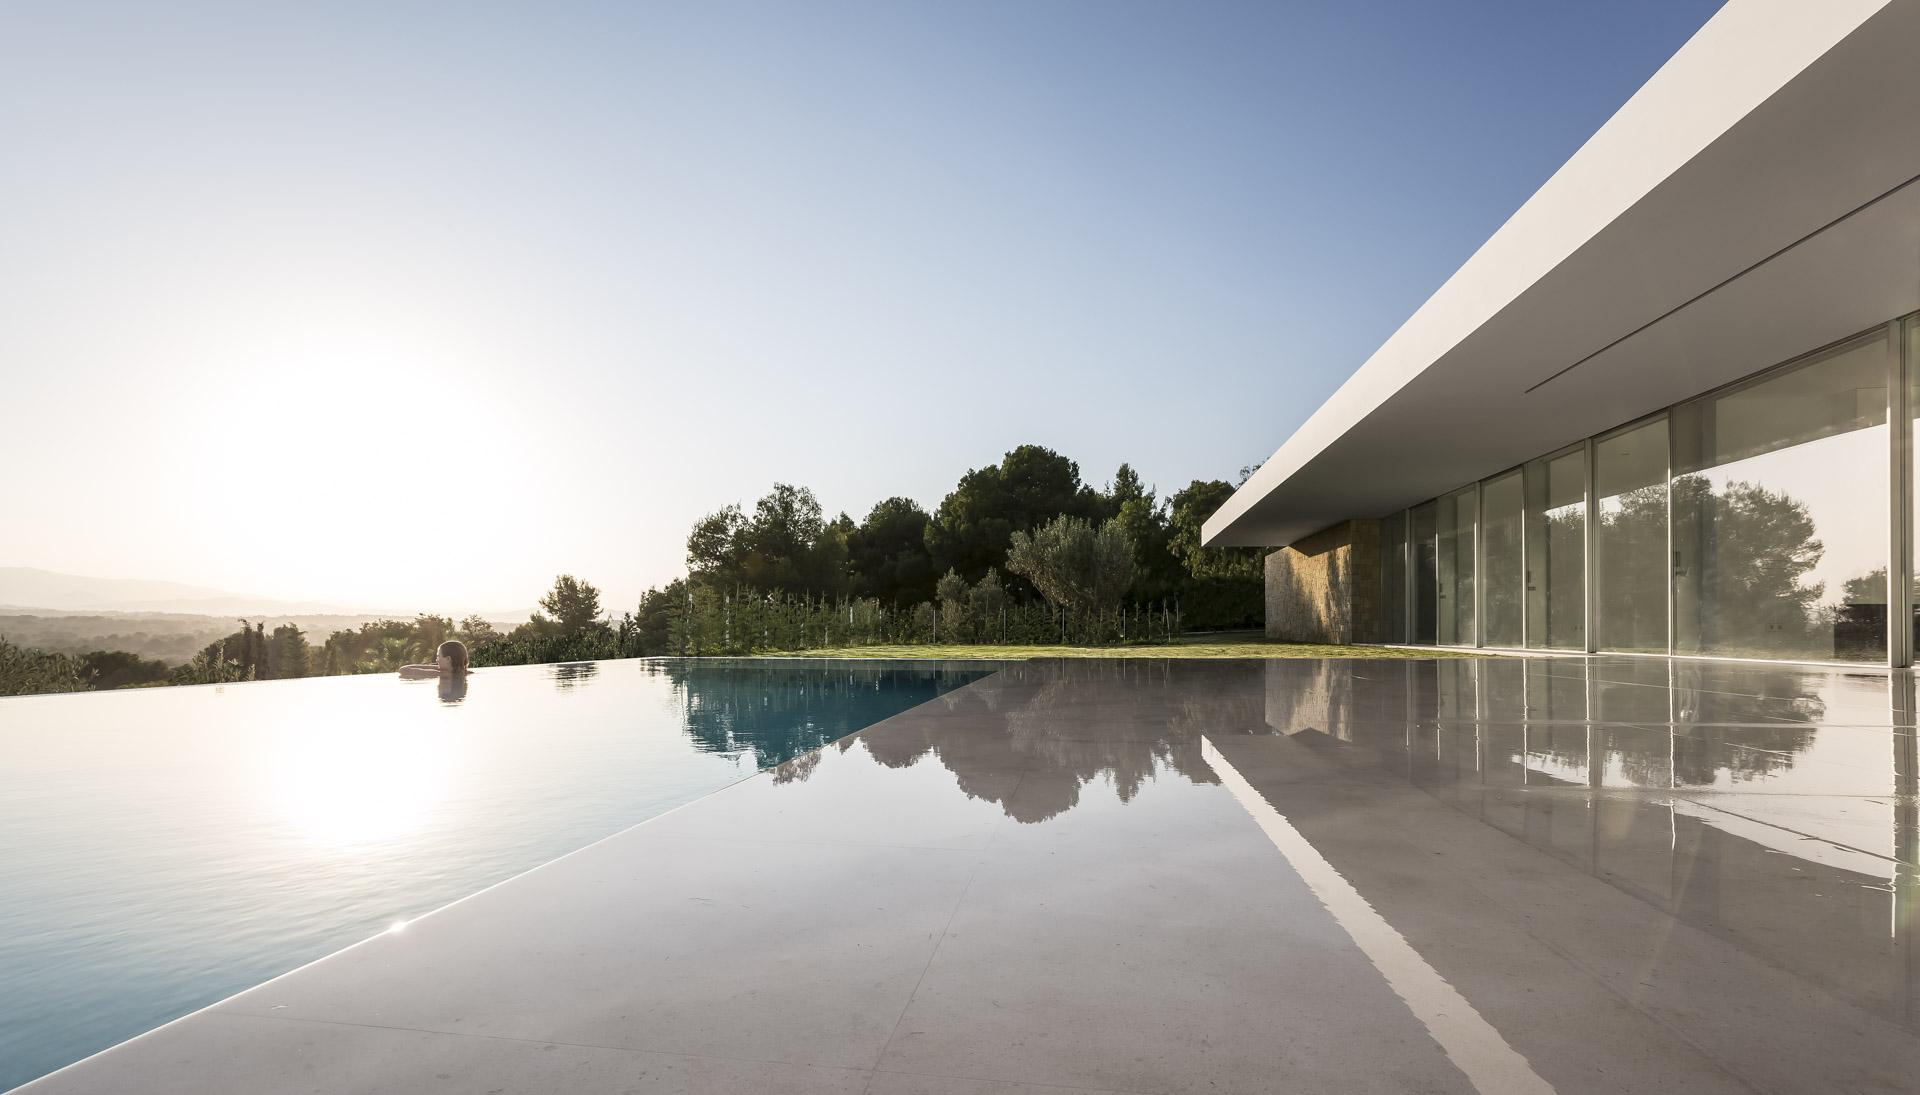 fotografia-arquitectura-valencia-german-cabo-gallardo-llopis-villamarchante-vivienda-47